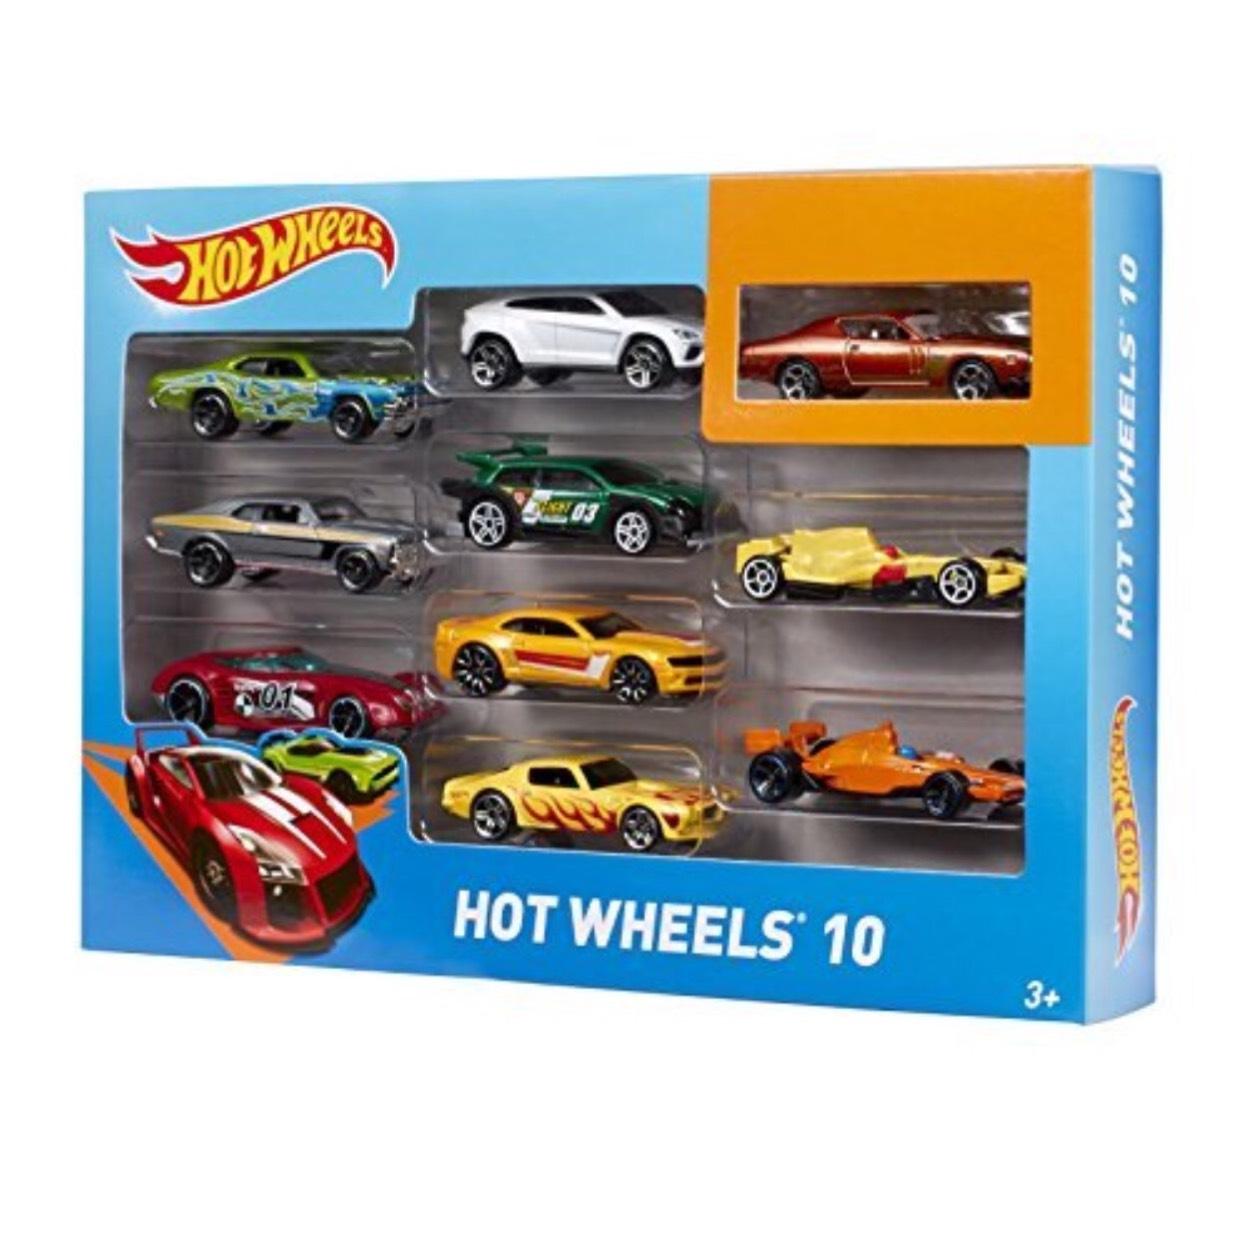 [amazon.de] Hot Wheels Mattel Fahrzeuge 10er Geschenkset